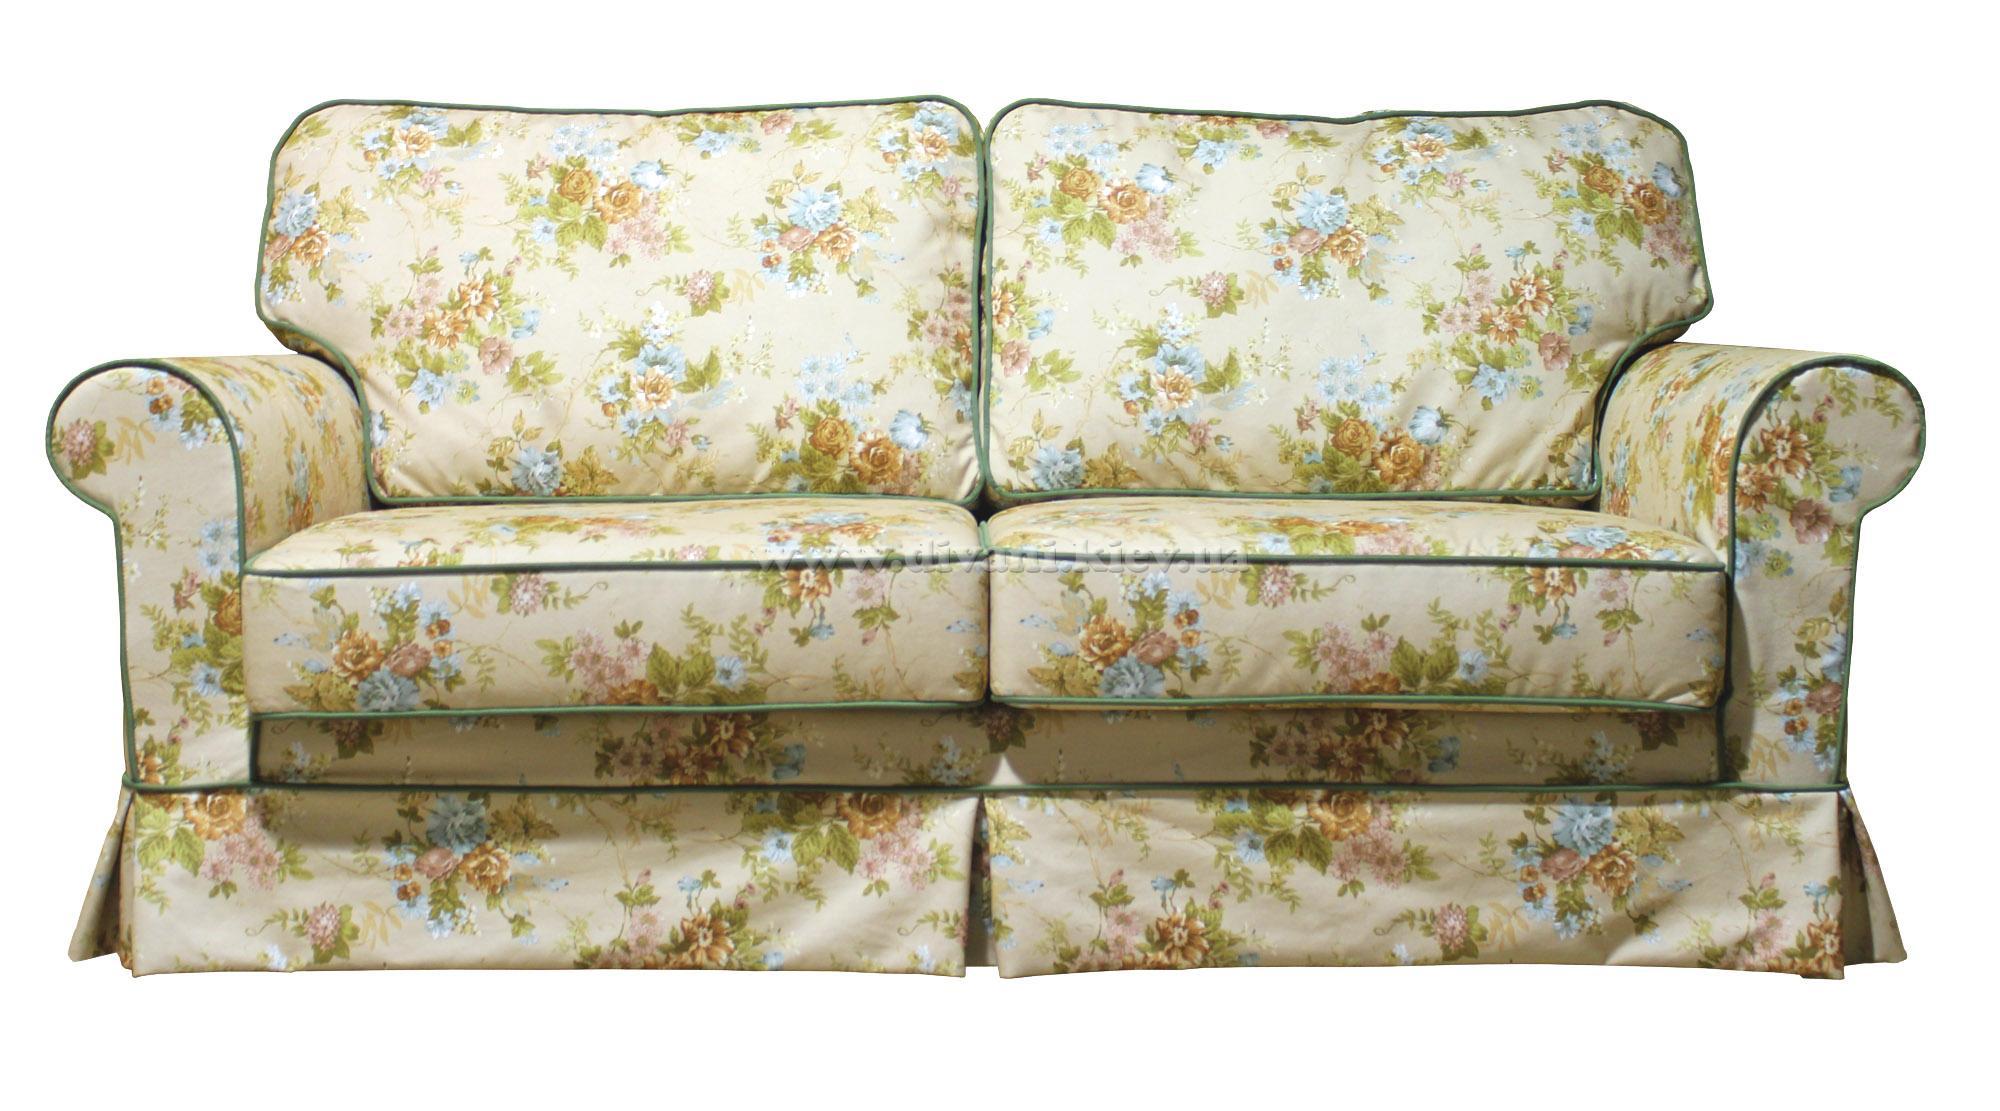 Крісті - мебельная фабрика УкрИзраМебель. Фото №1. | Диваны для нирваны